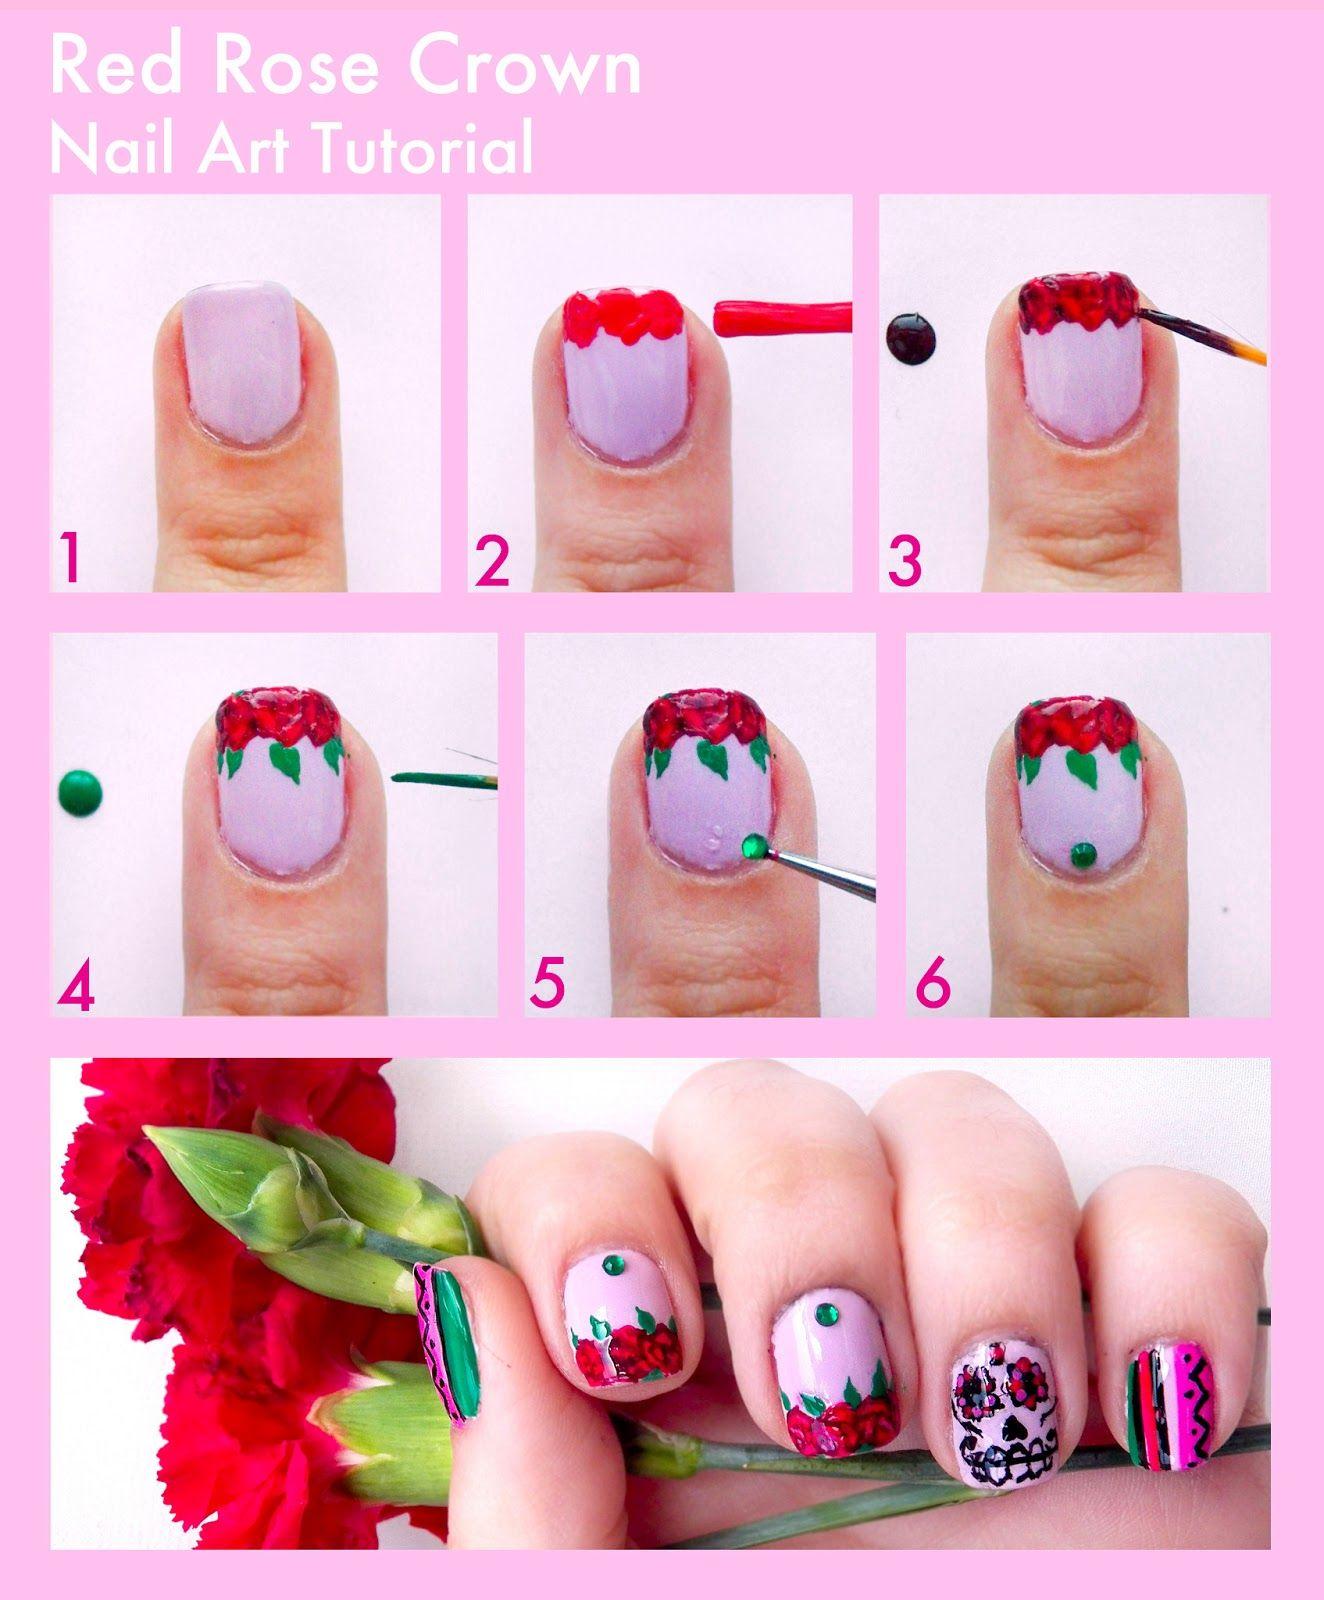 Step By Step Nail Art Google Search Niall's Pinterest Nail